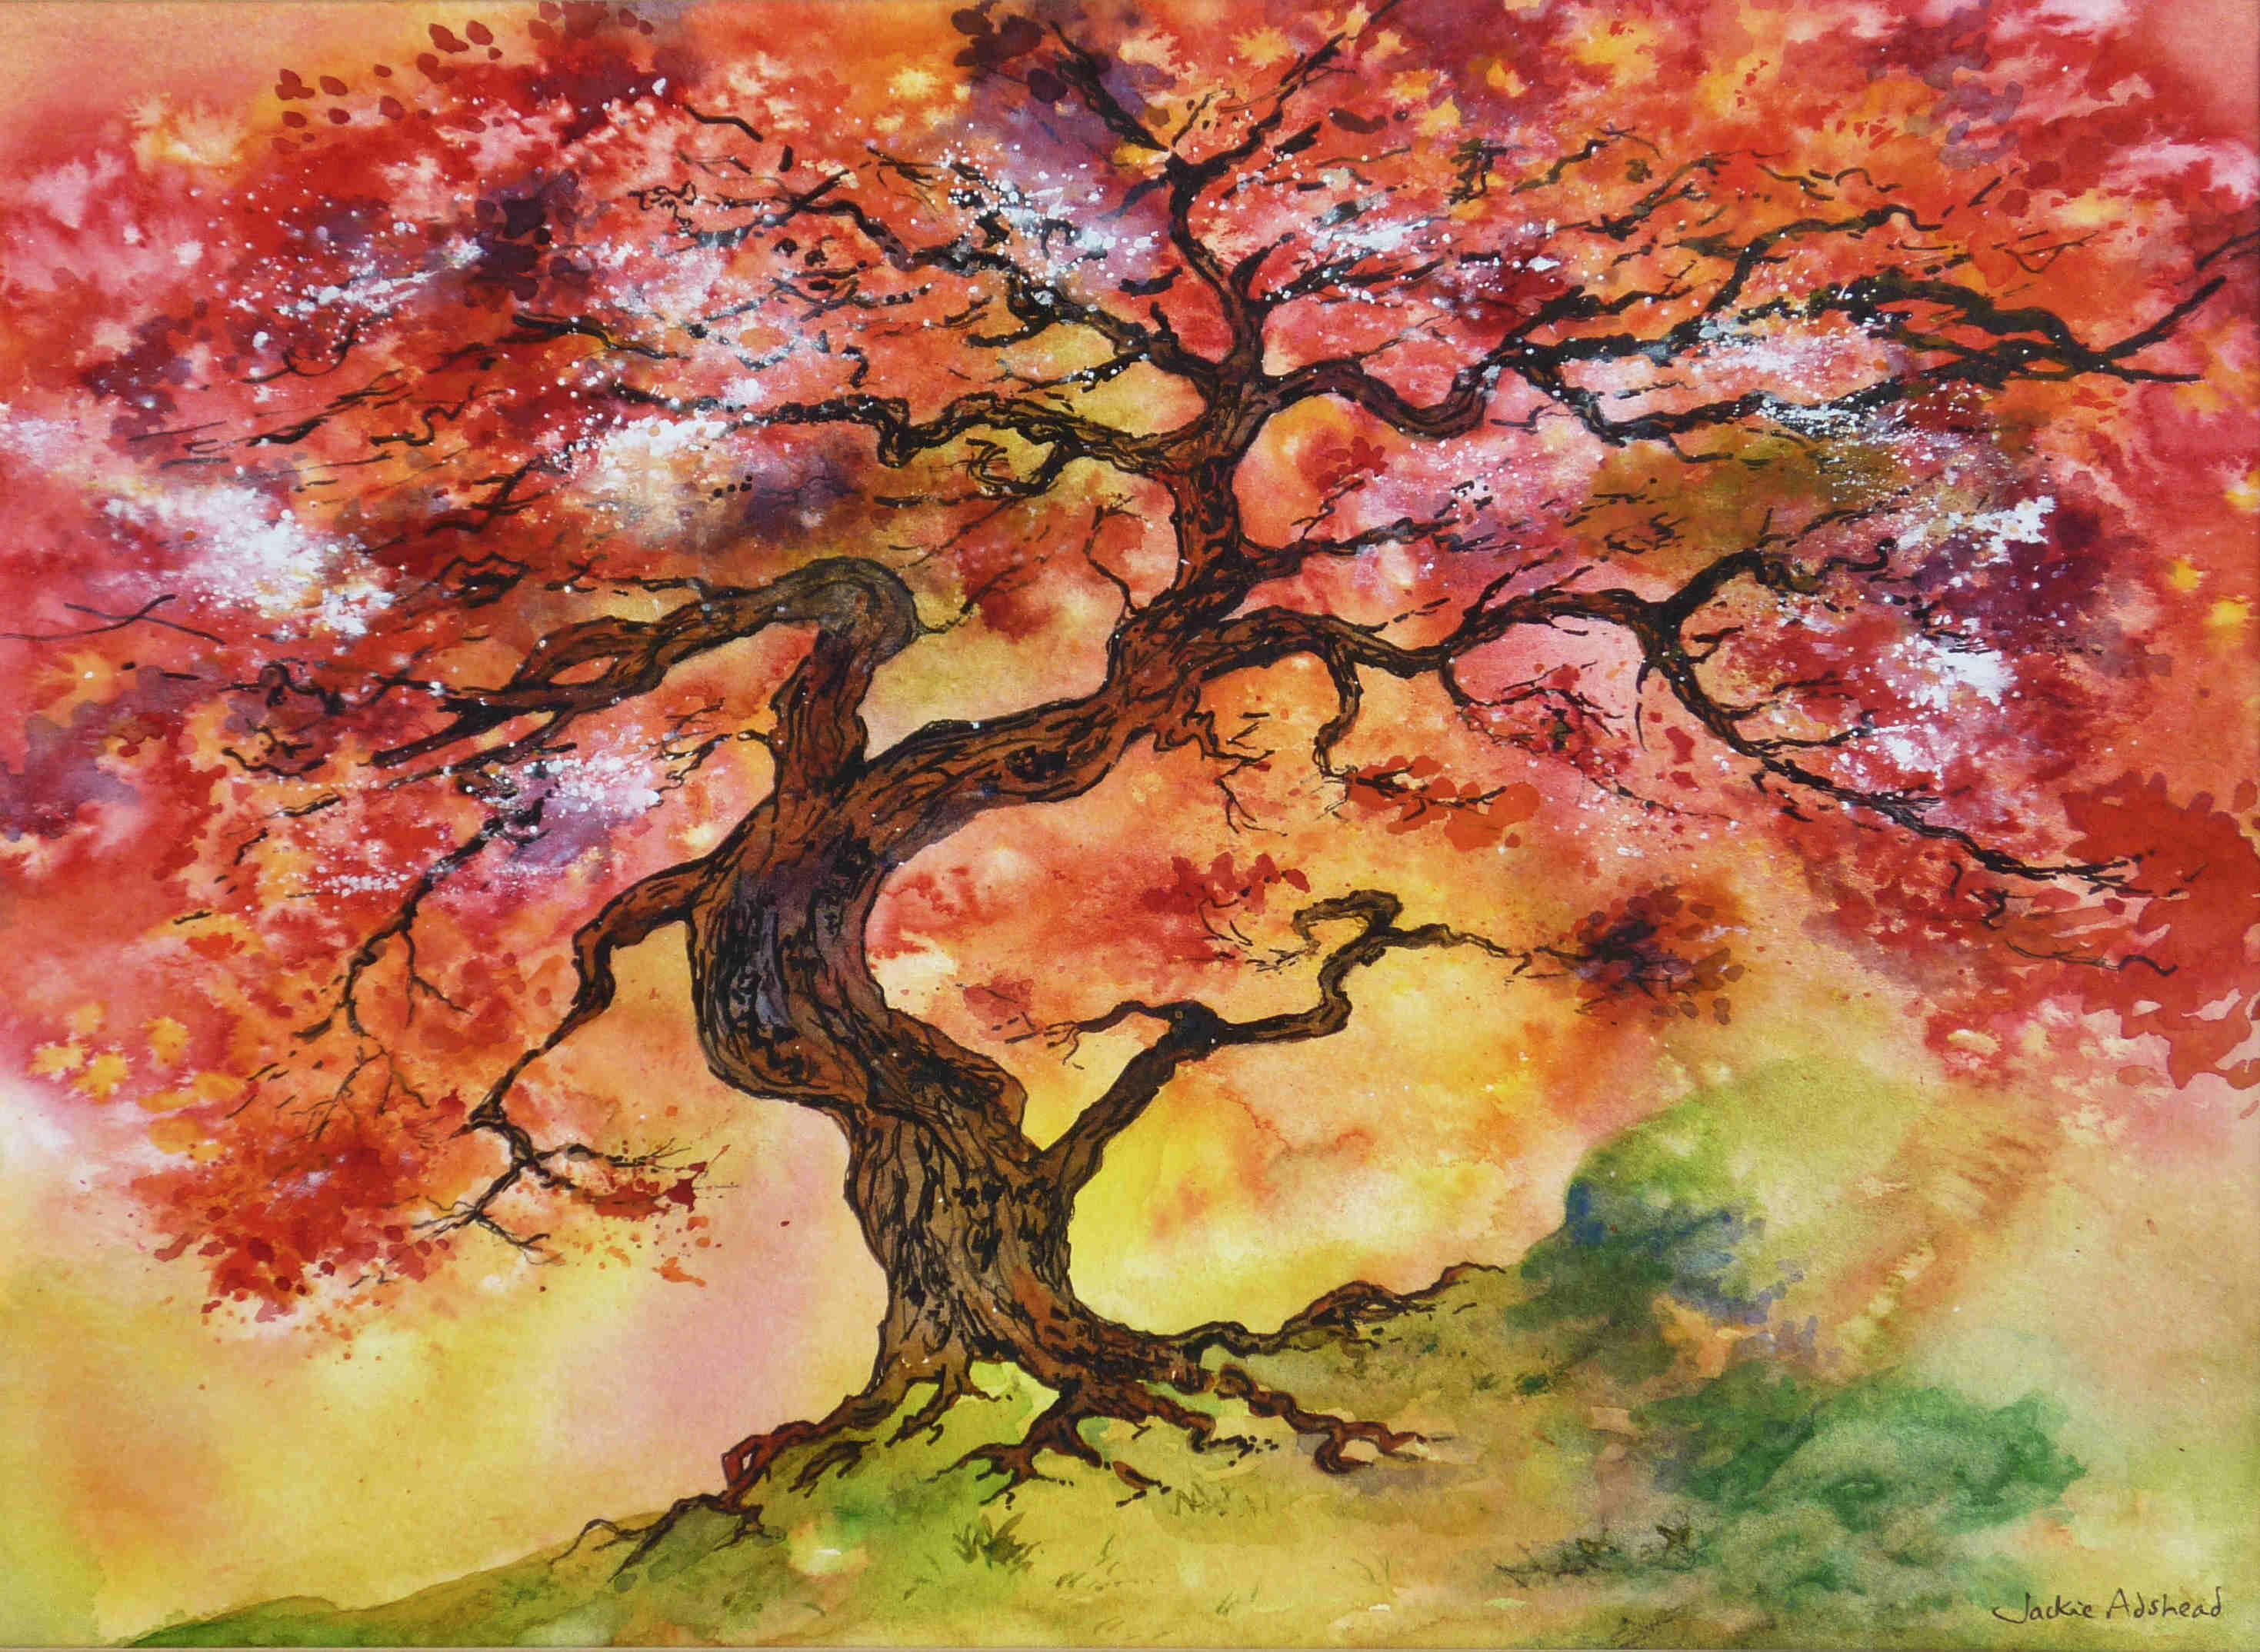 Tree of dreams salted but not shaken